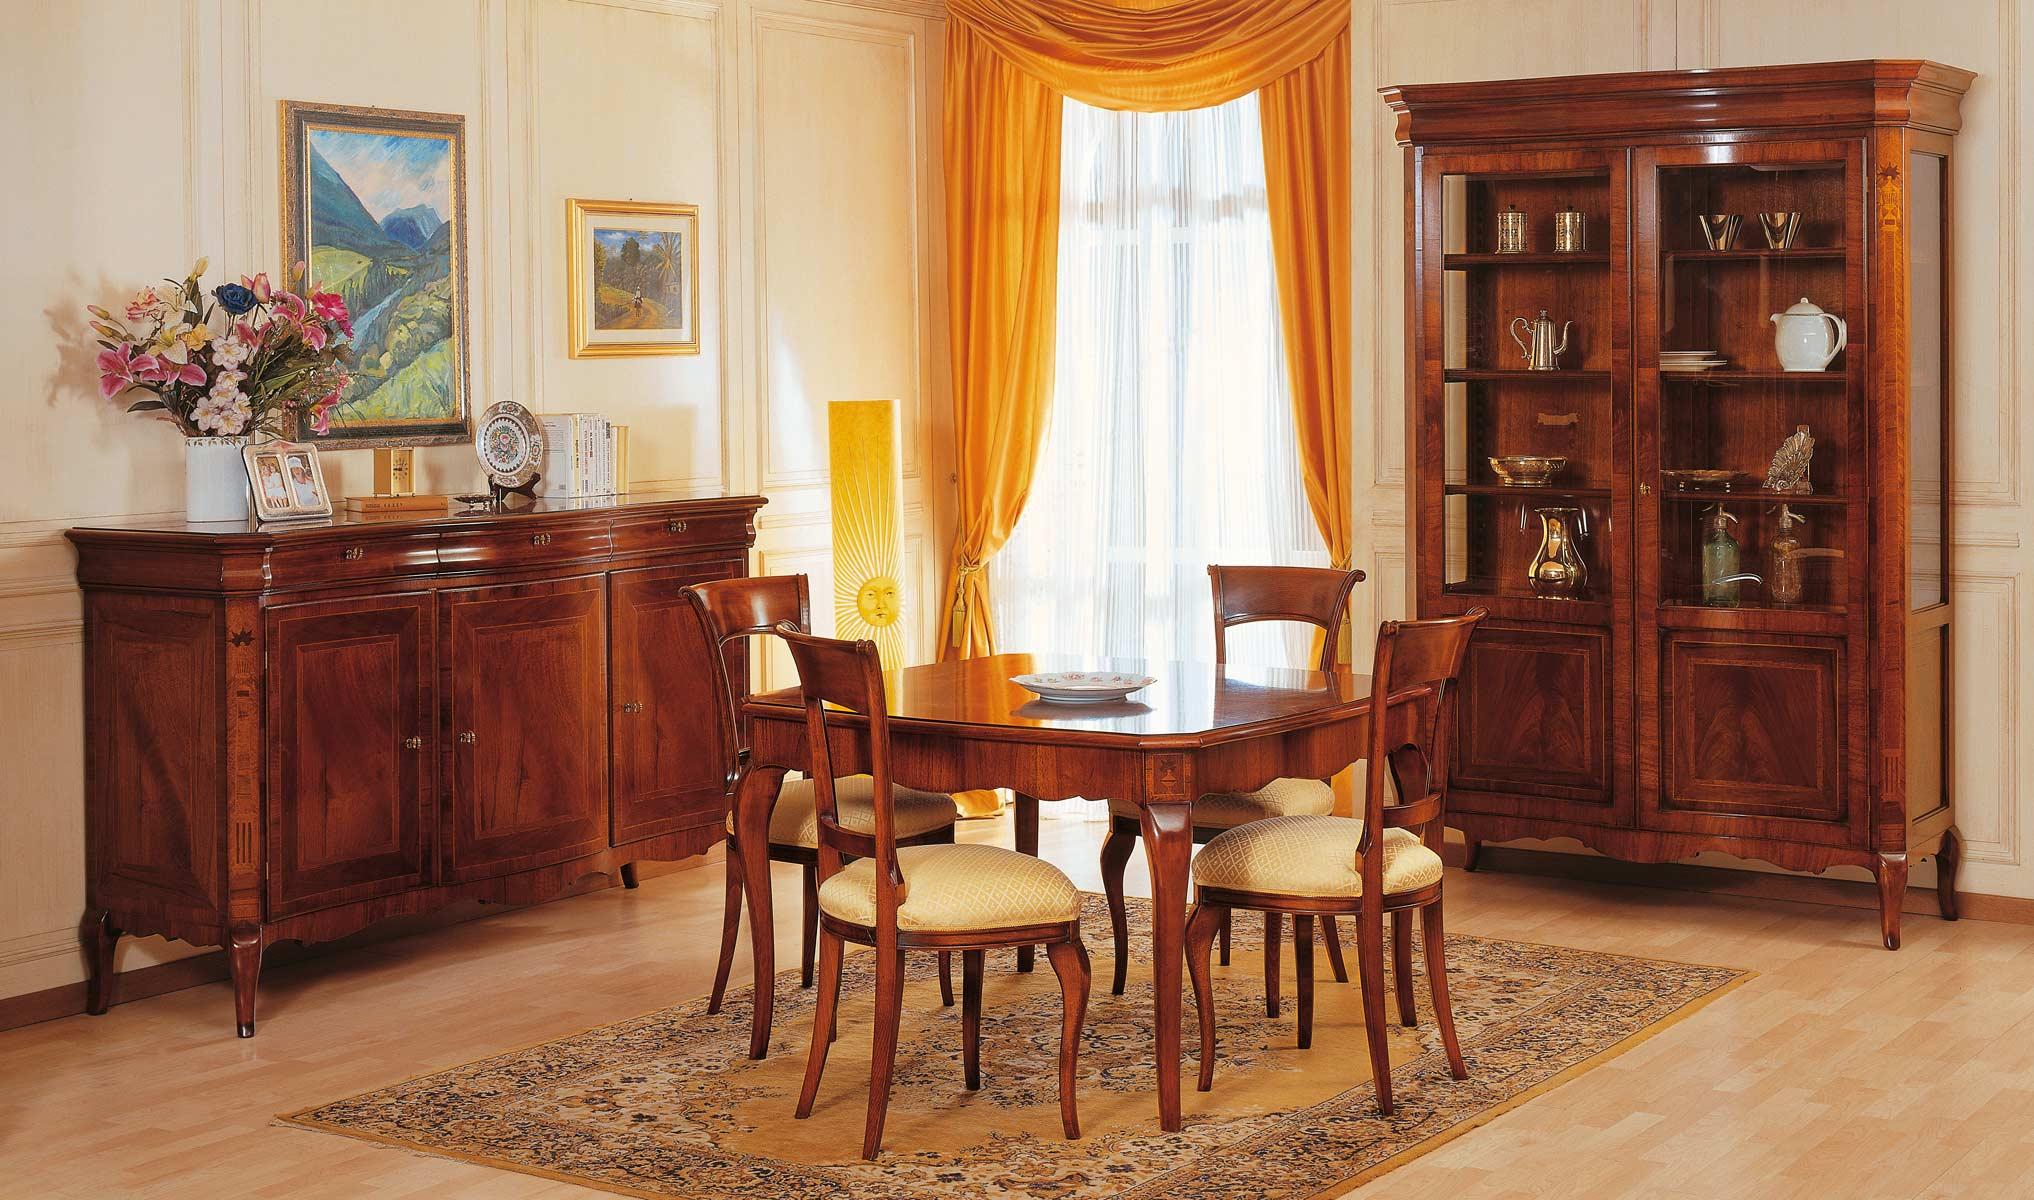 Sala Da Pranzo In Stile 800 Francese Vimercati Meda #BA8911 2034 1200 Sale Da Pranzo Classiche